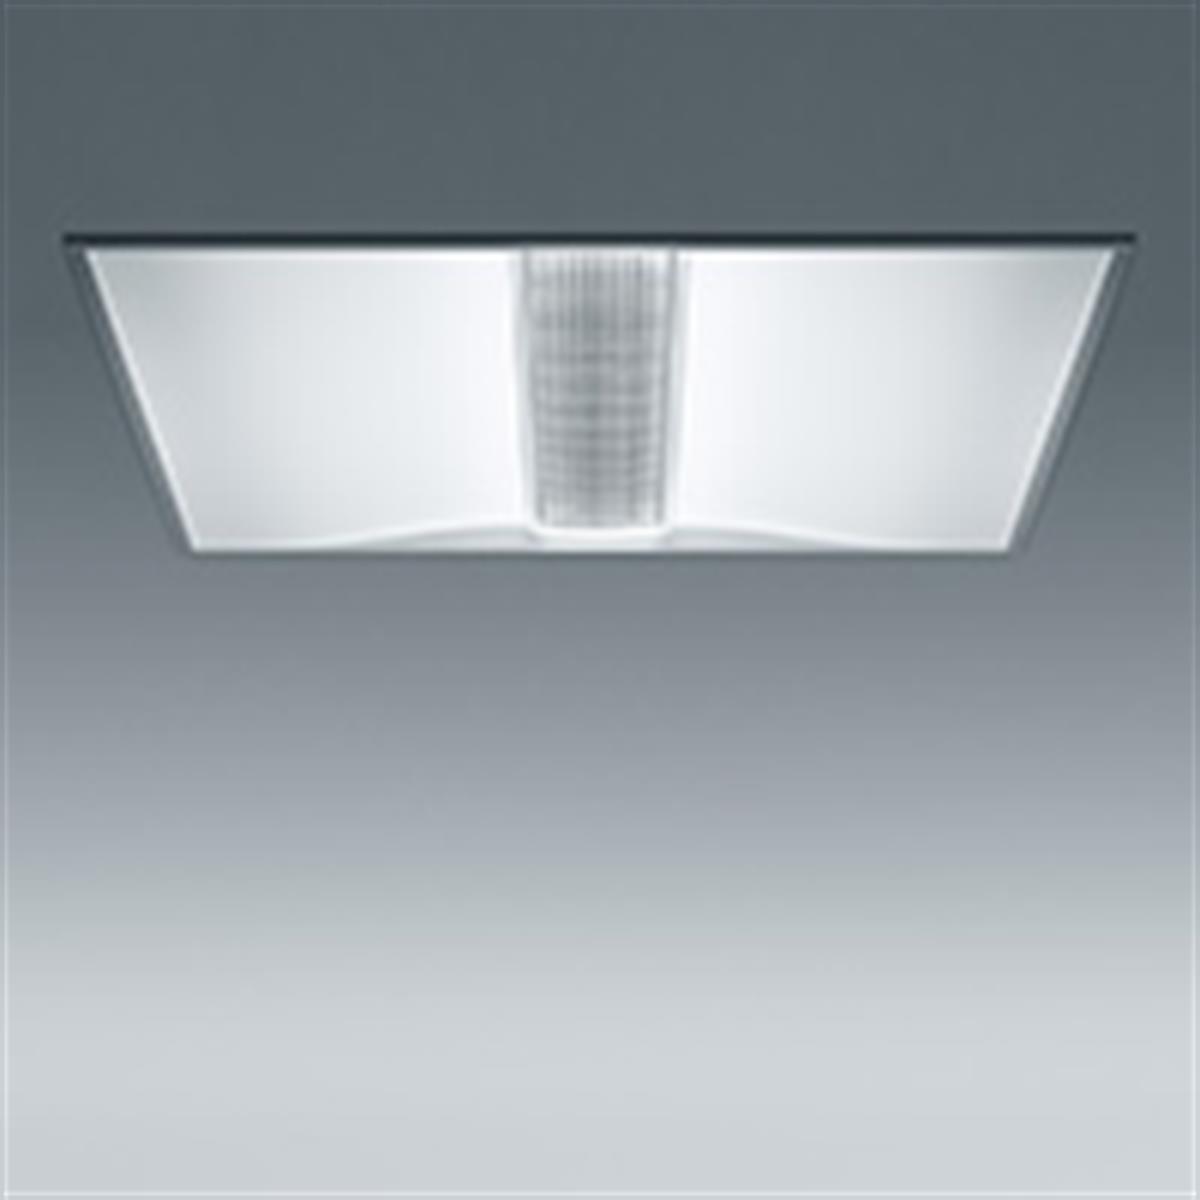 zumtobel lighting innenbeleuchtung led beleuchtung editus. Black Bedroom Furniture Sets. Home Design Ideas